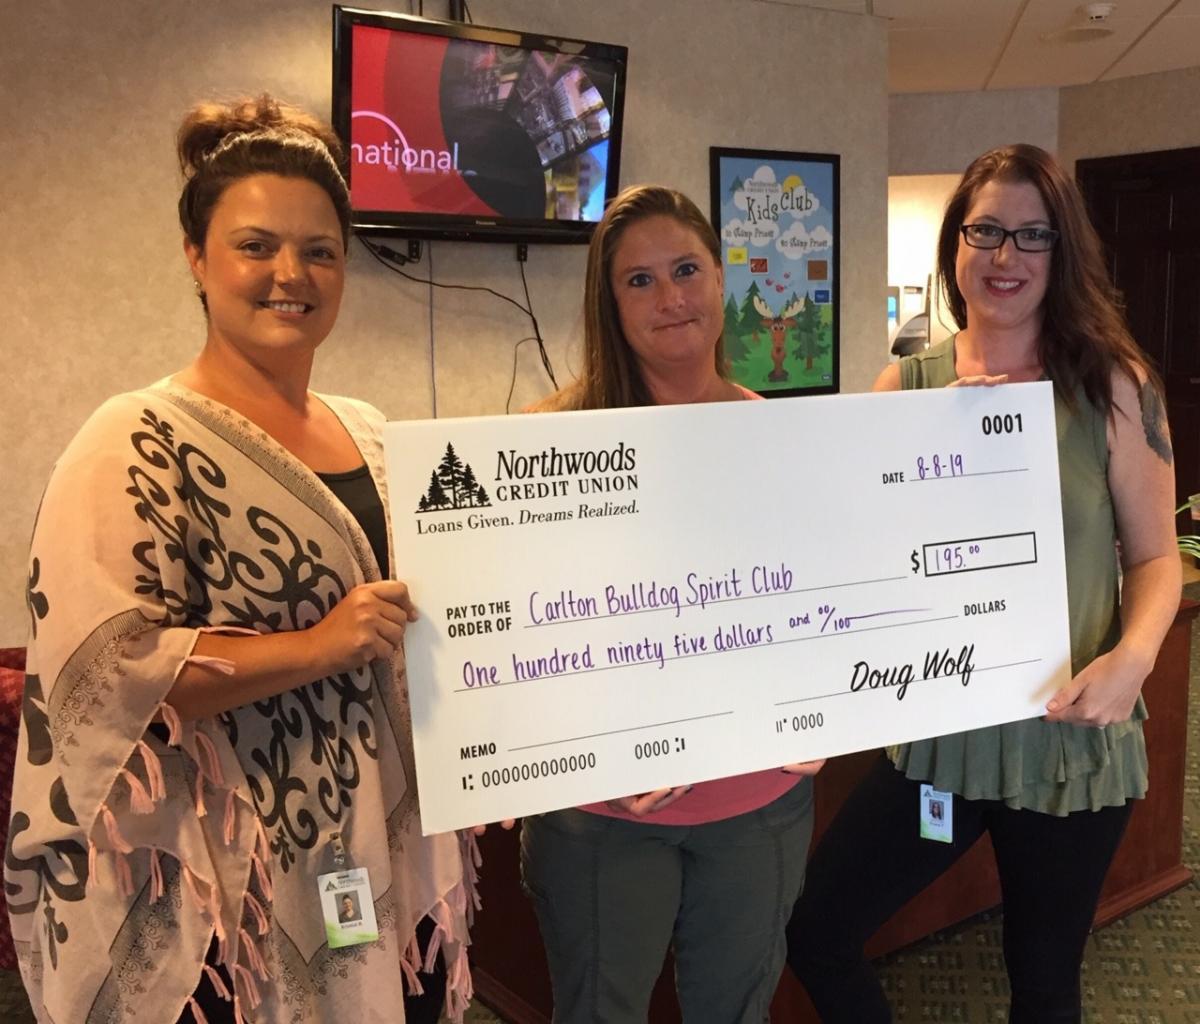 Northwoods CU employees presenting large check to Teresa of the Carlton Bulldog Spirit Club